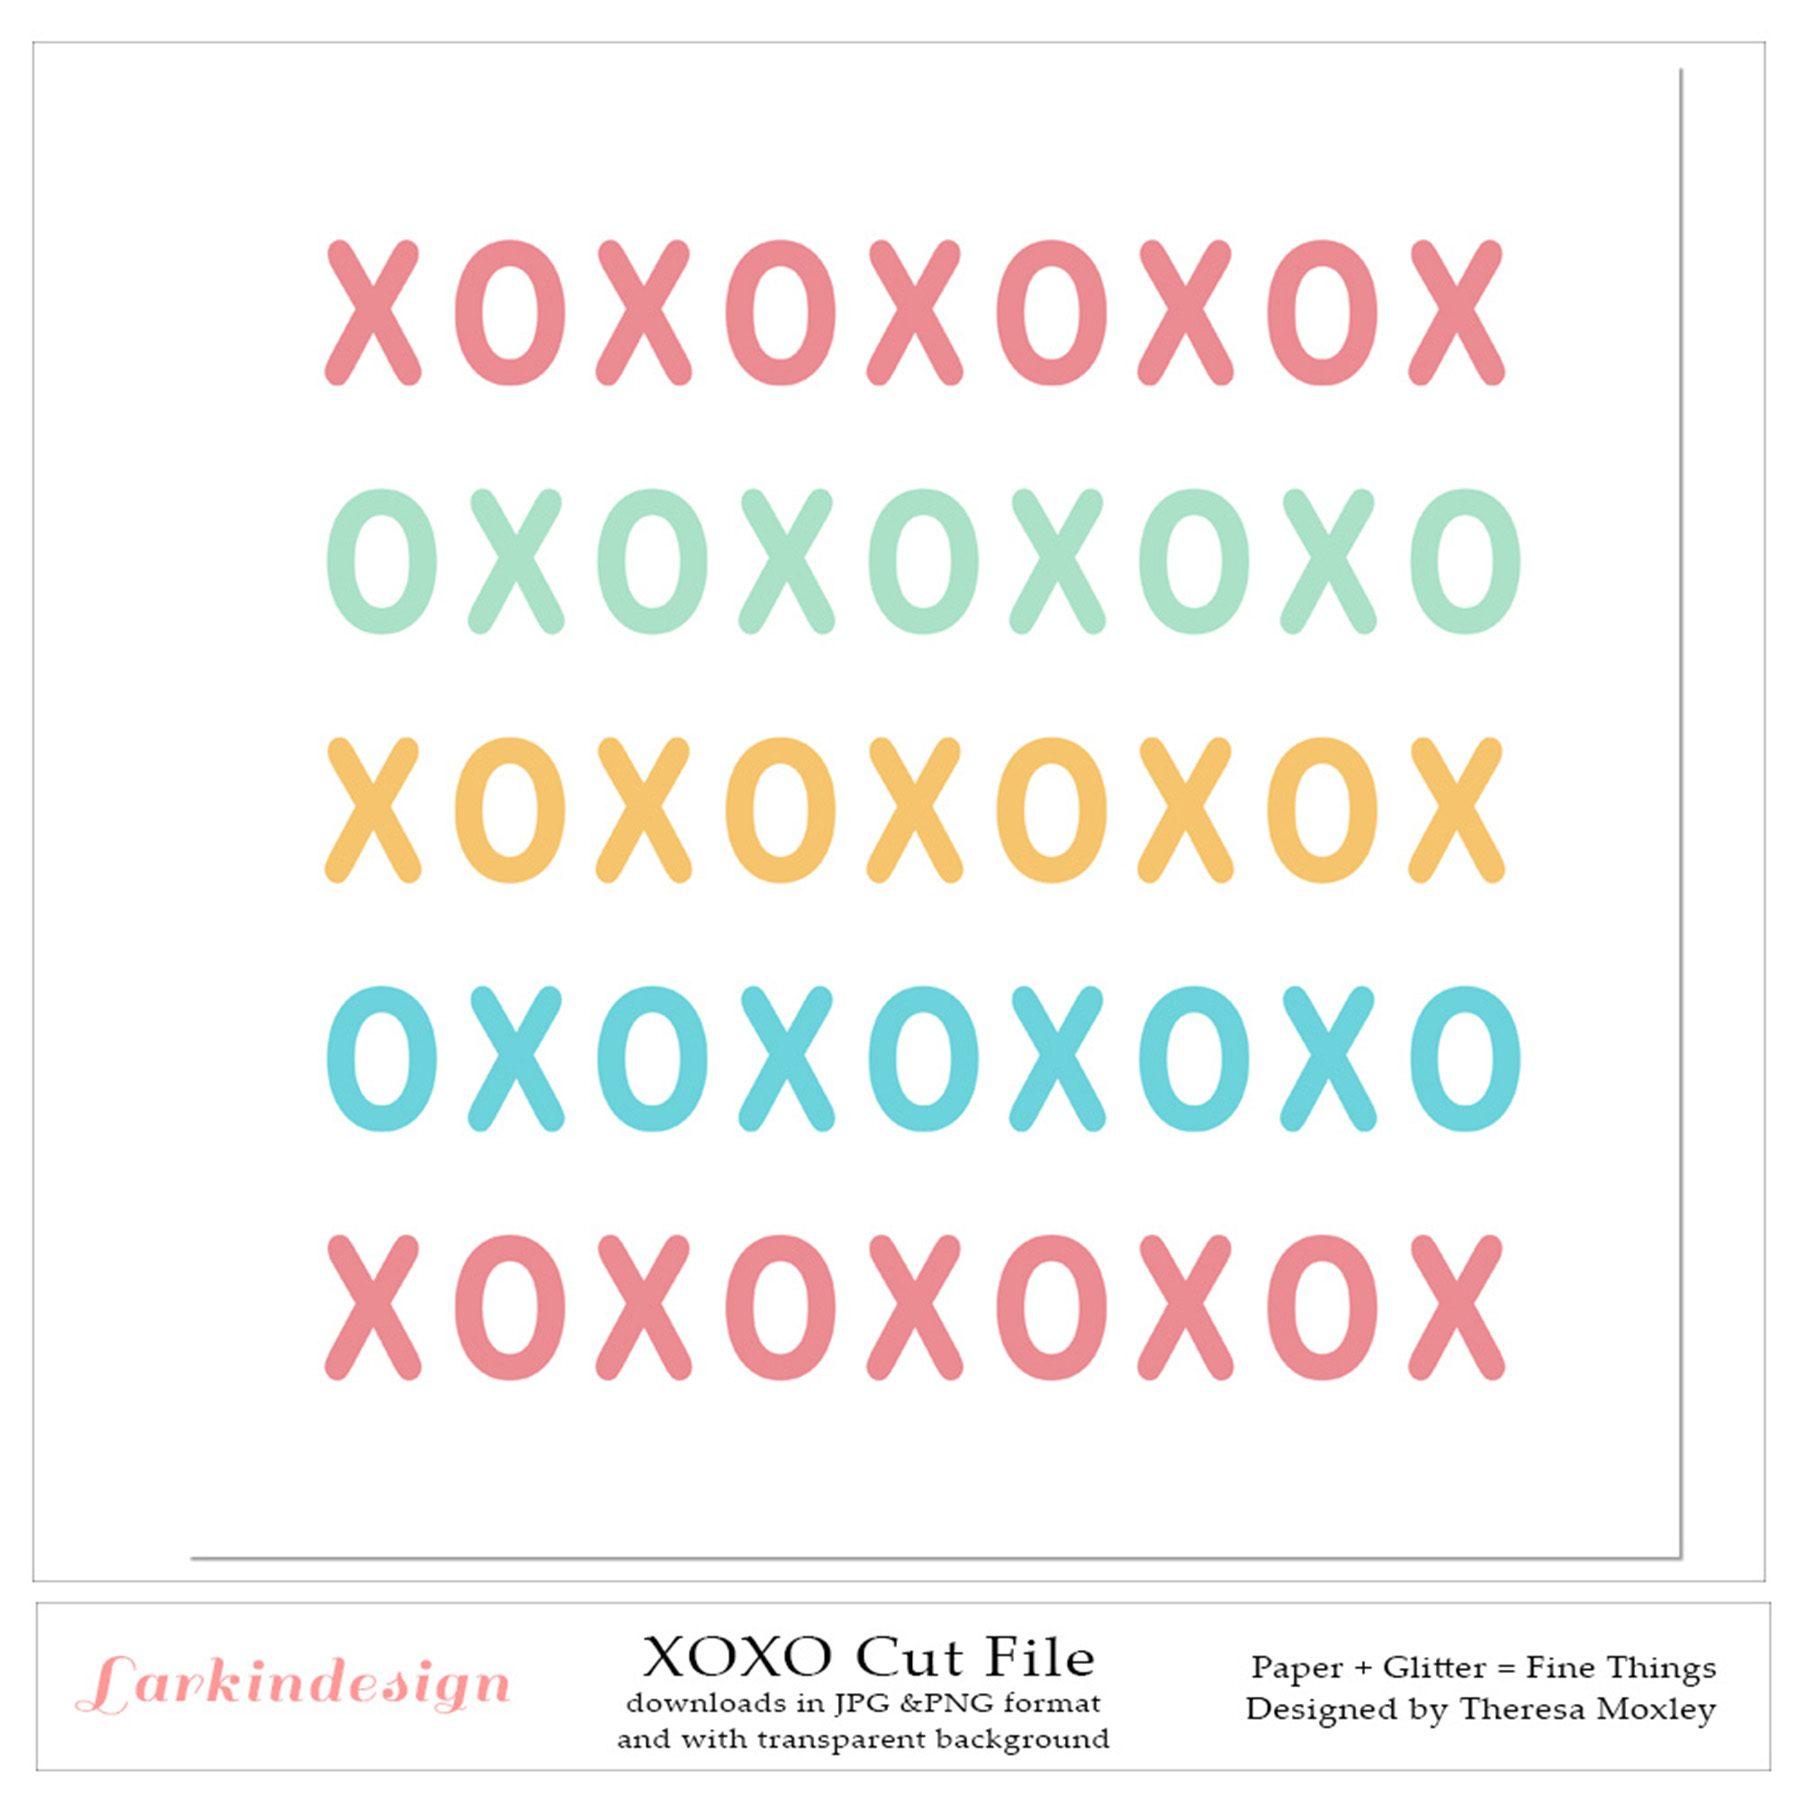 XOXO Digital Cut File